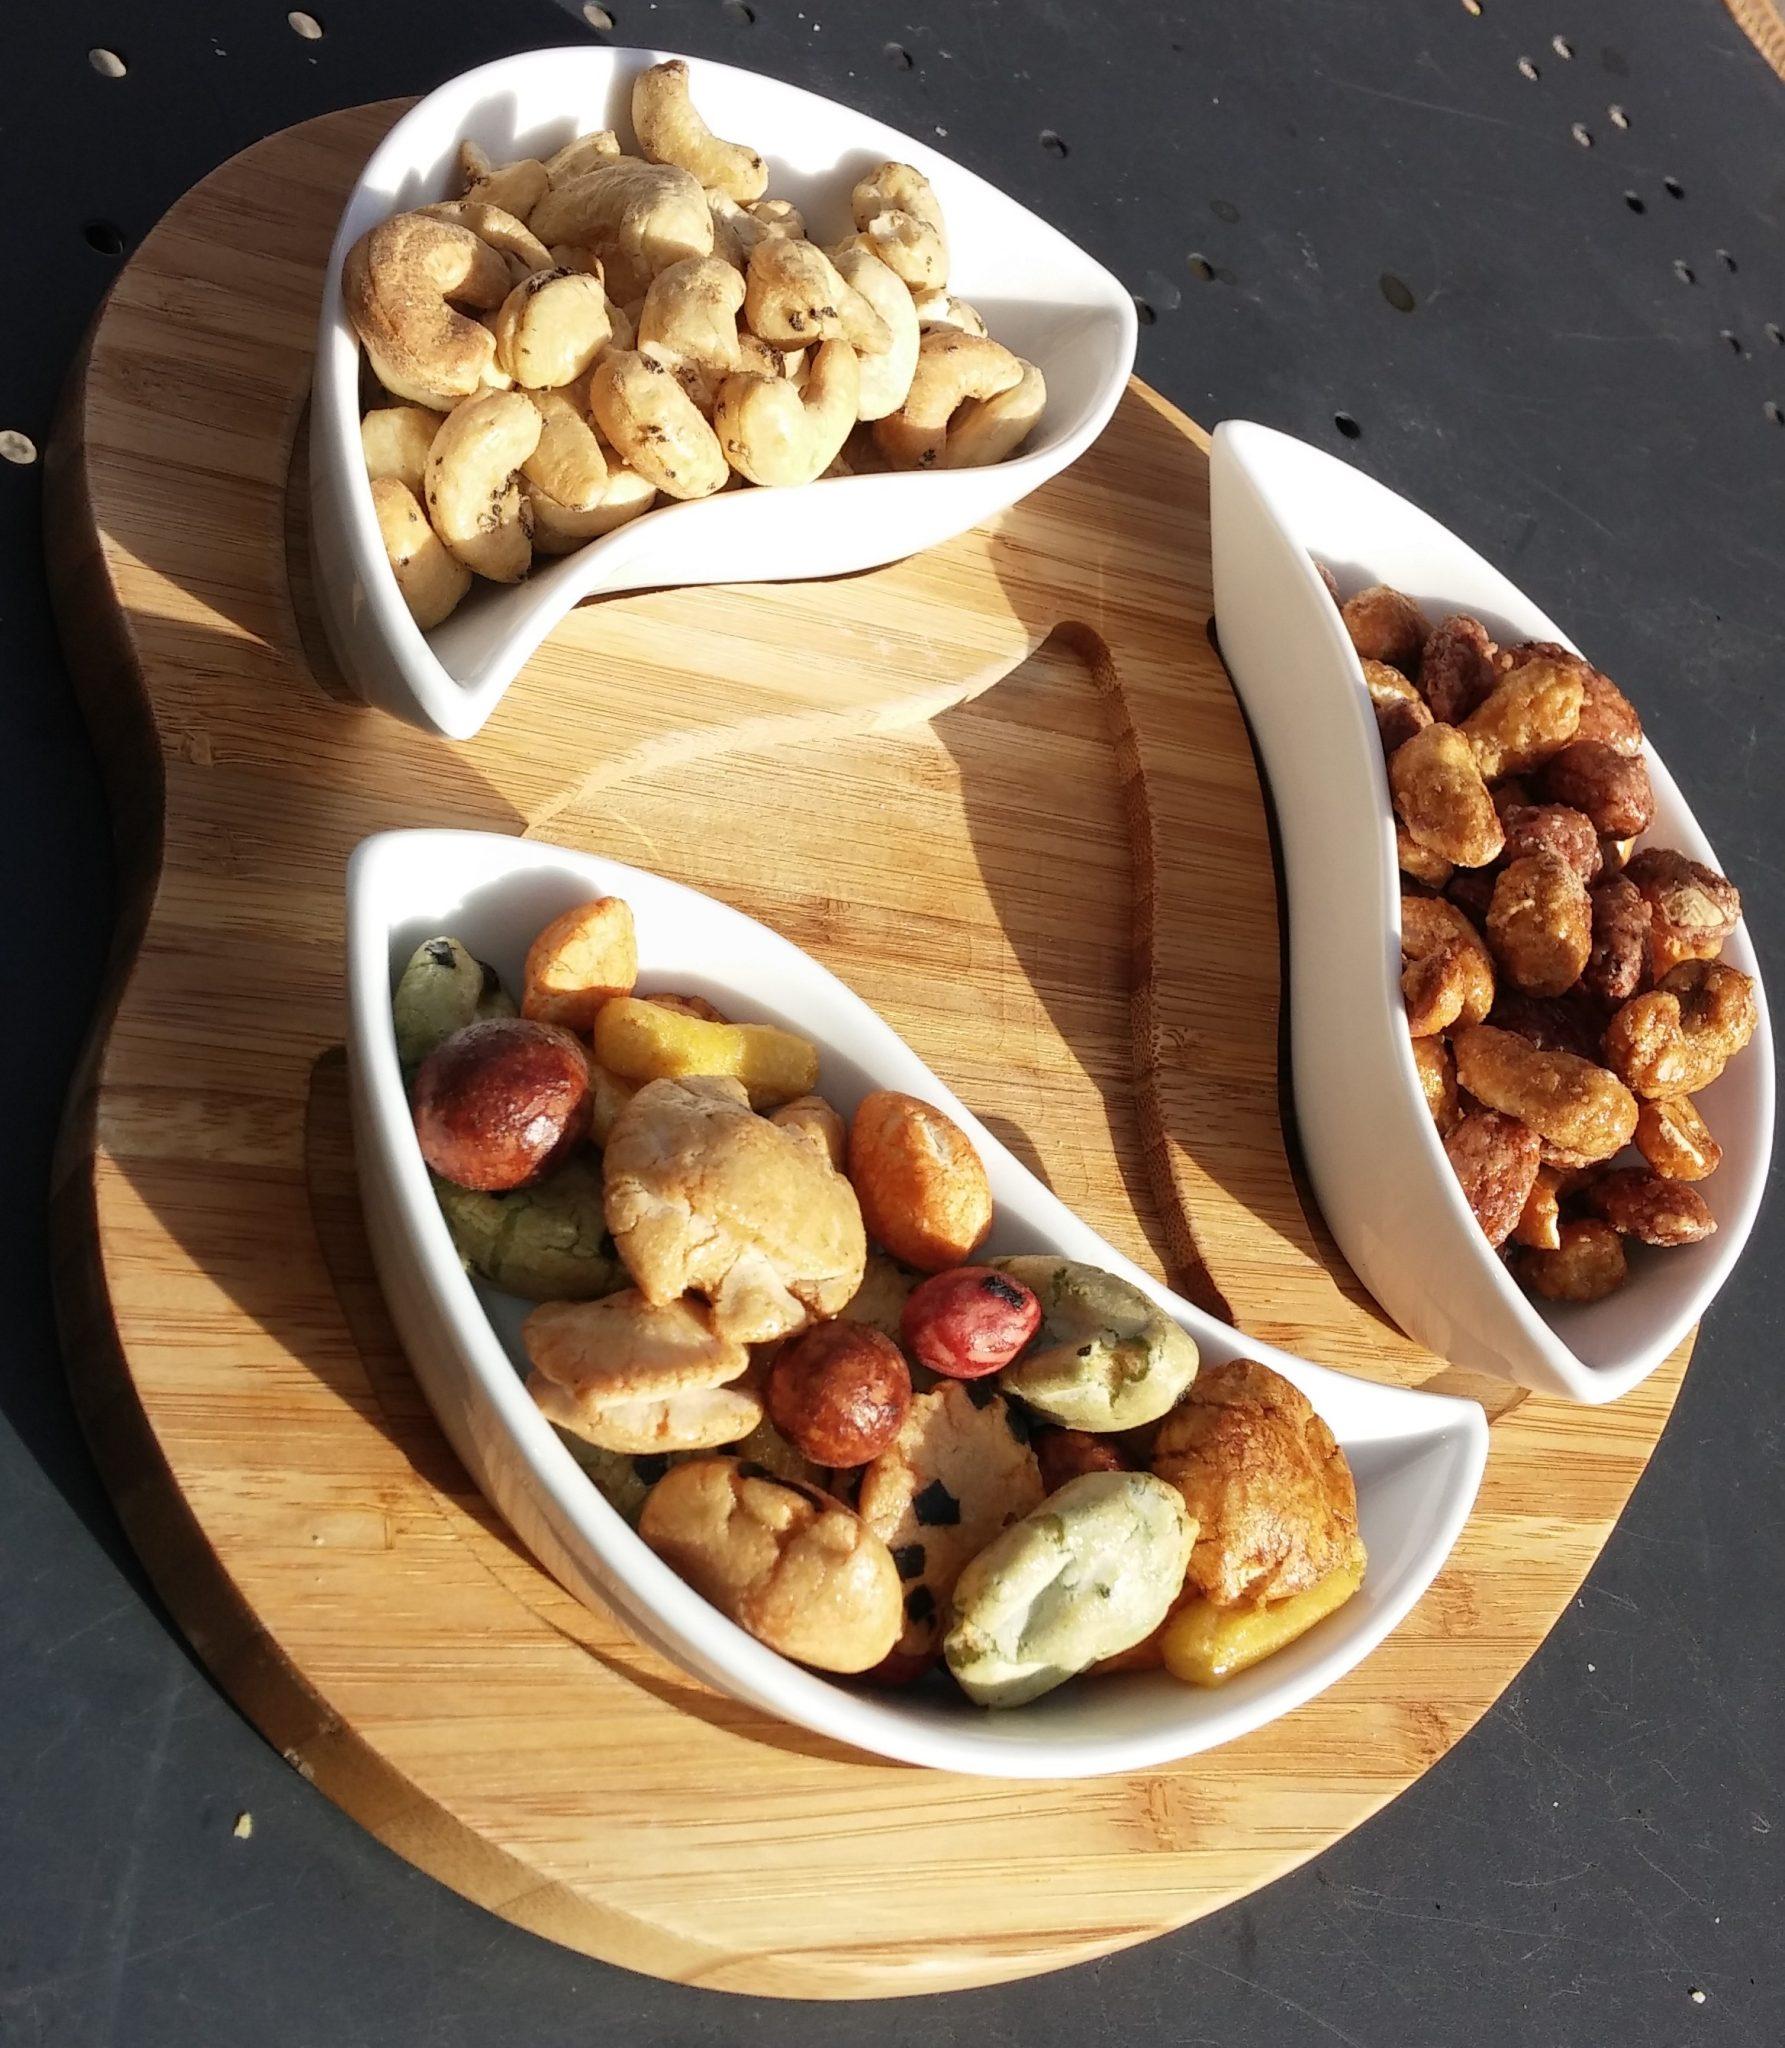 Blacksmiths Loft_Cashews, nuts, Japanese crackers